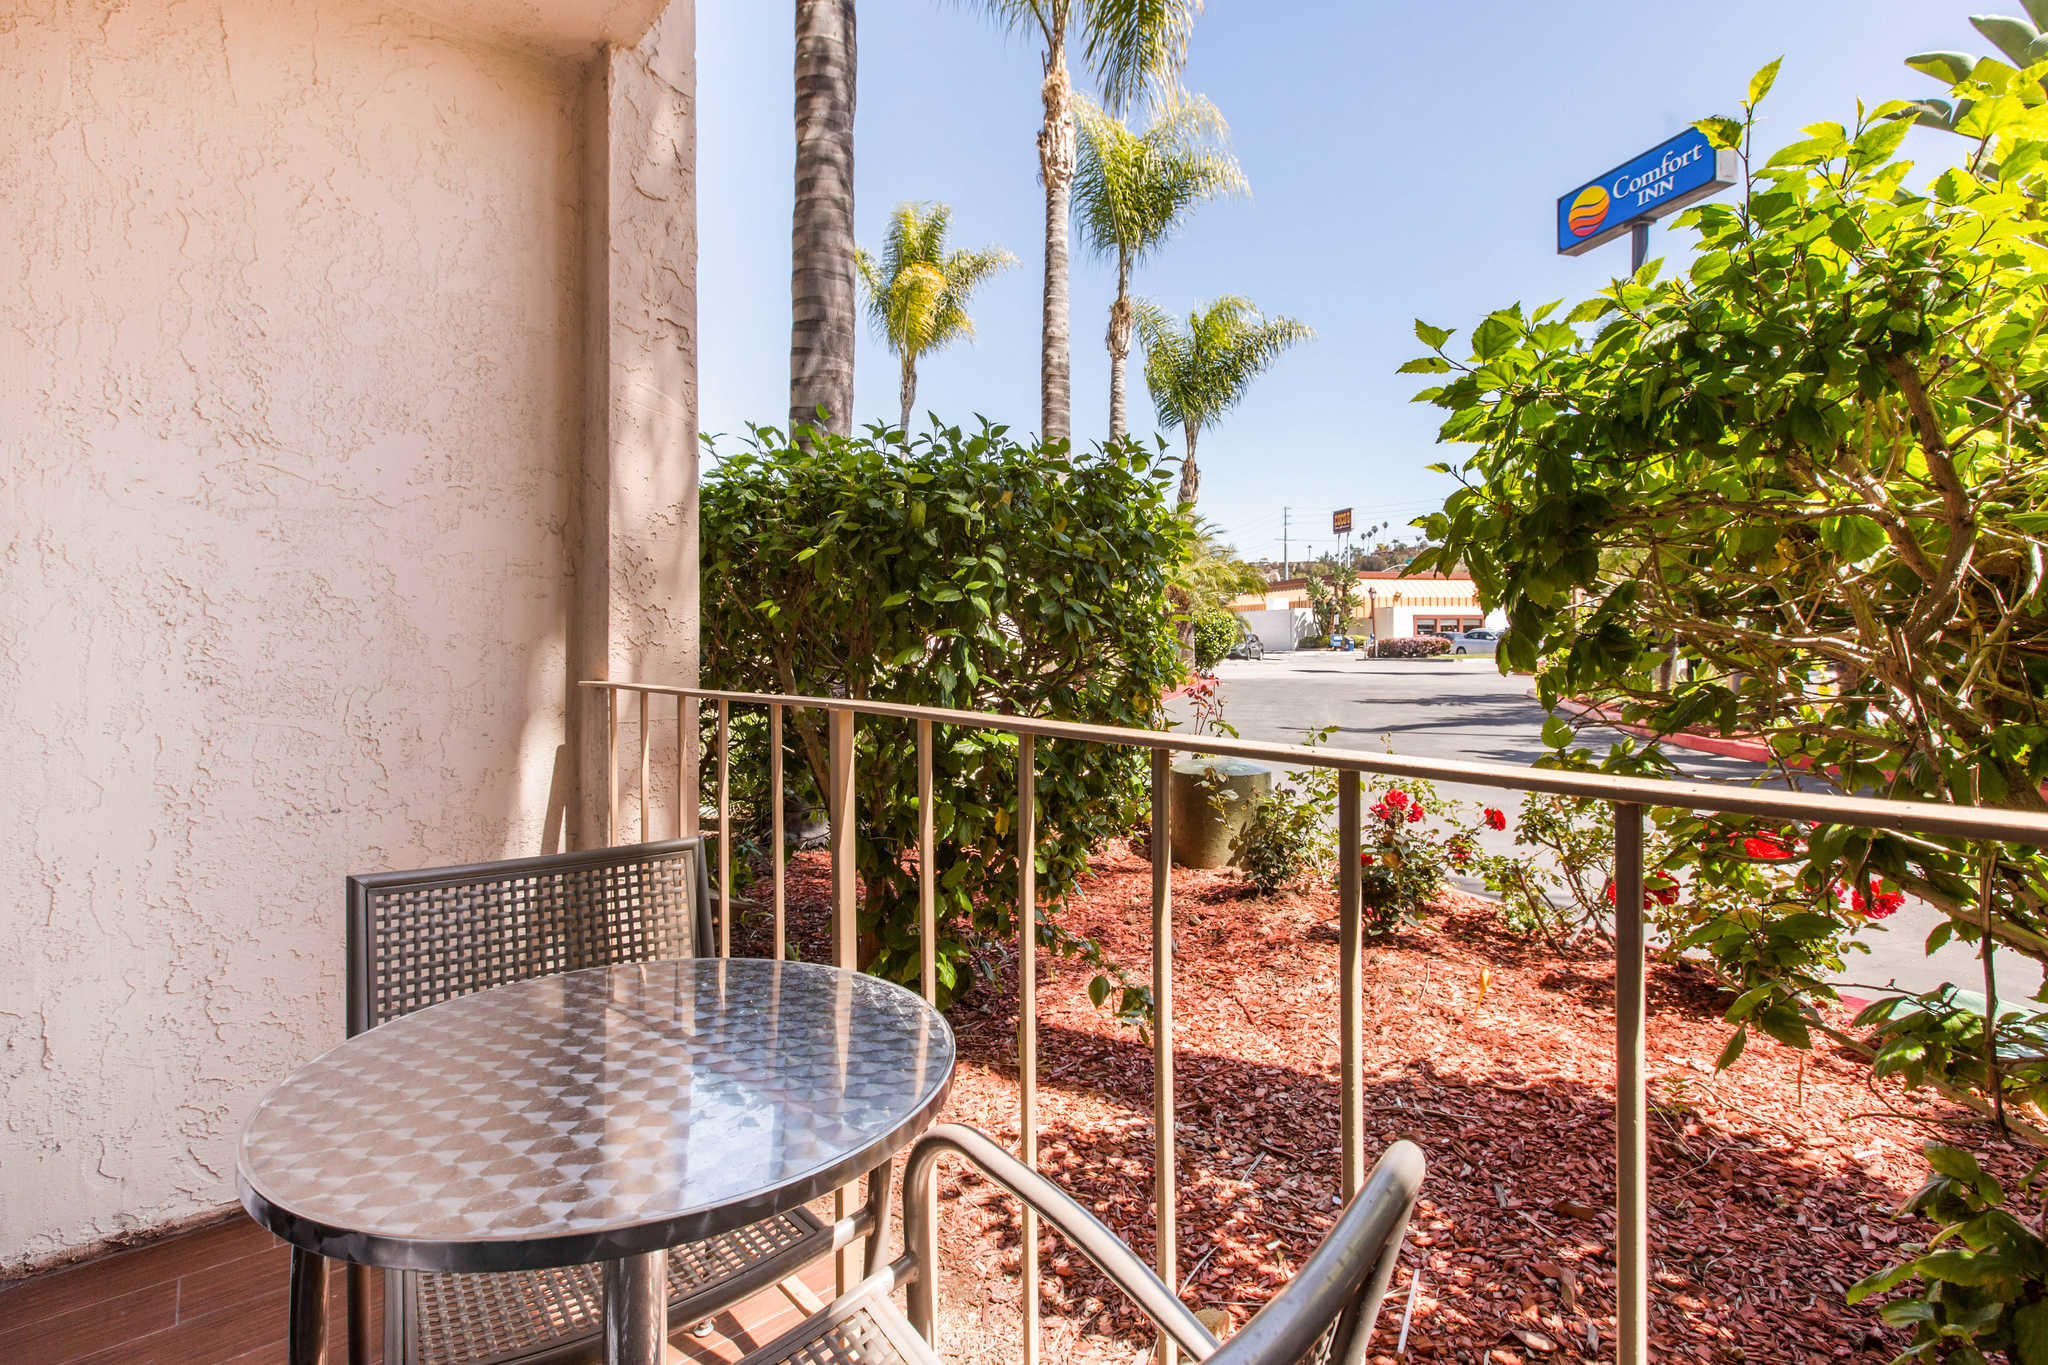 Comfort Inn Escondido San Diego North County image 19